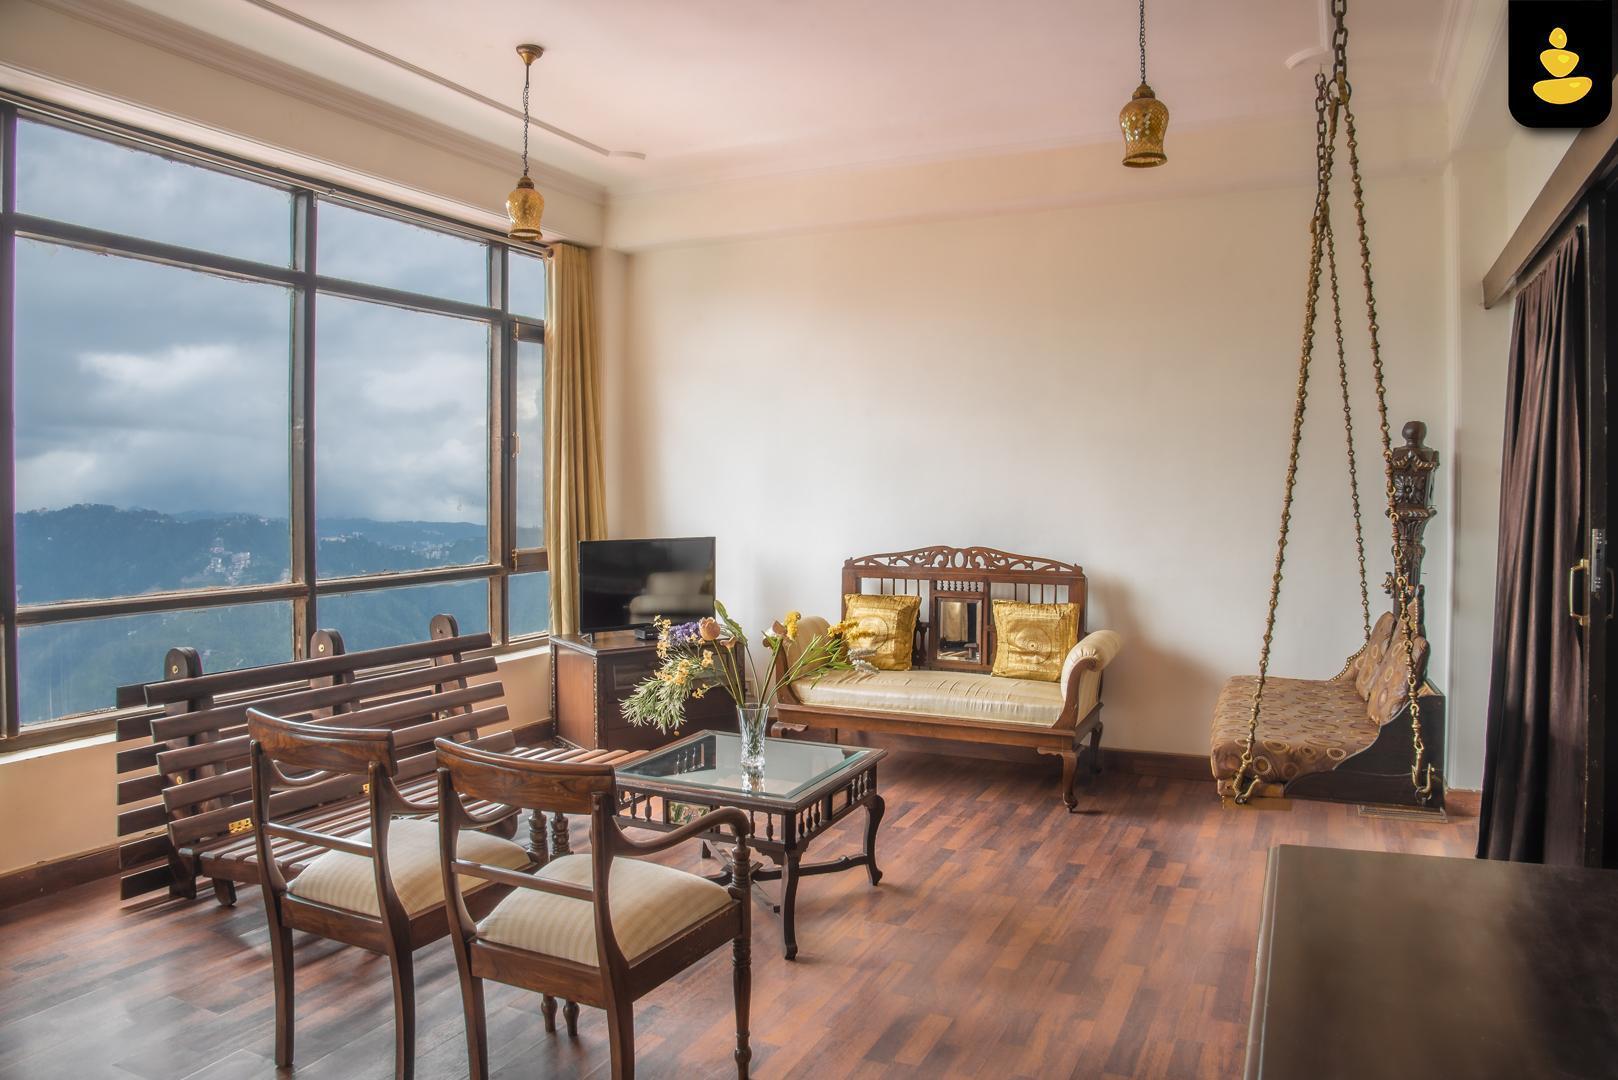 LivingStone   2BHK Apartment   Woodstay   Mashobra